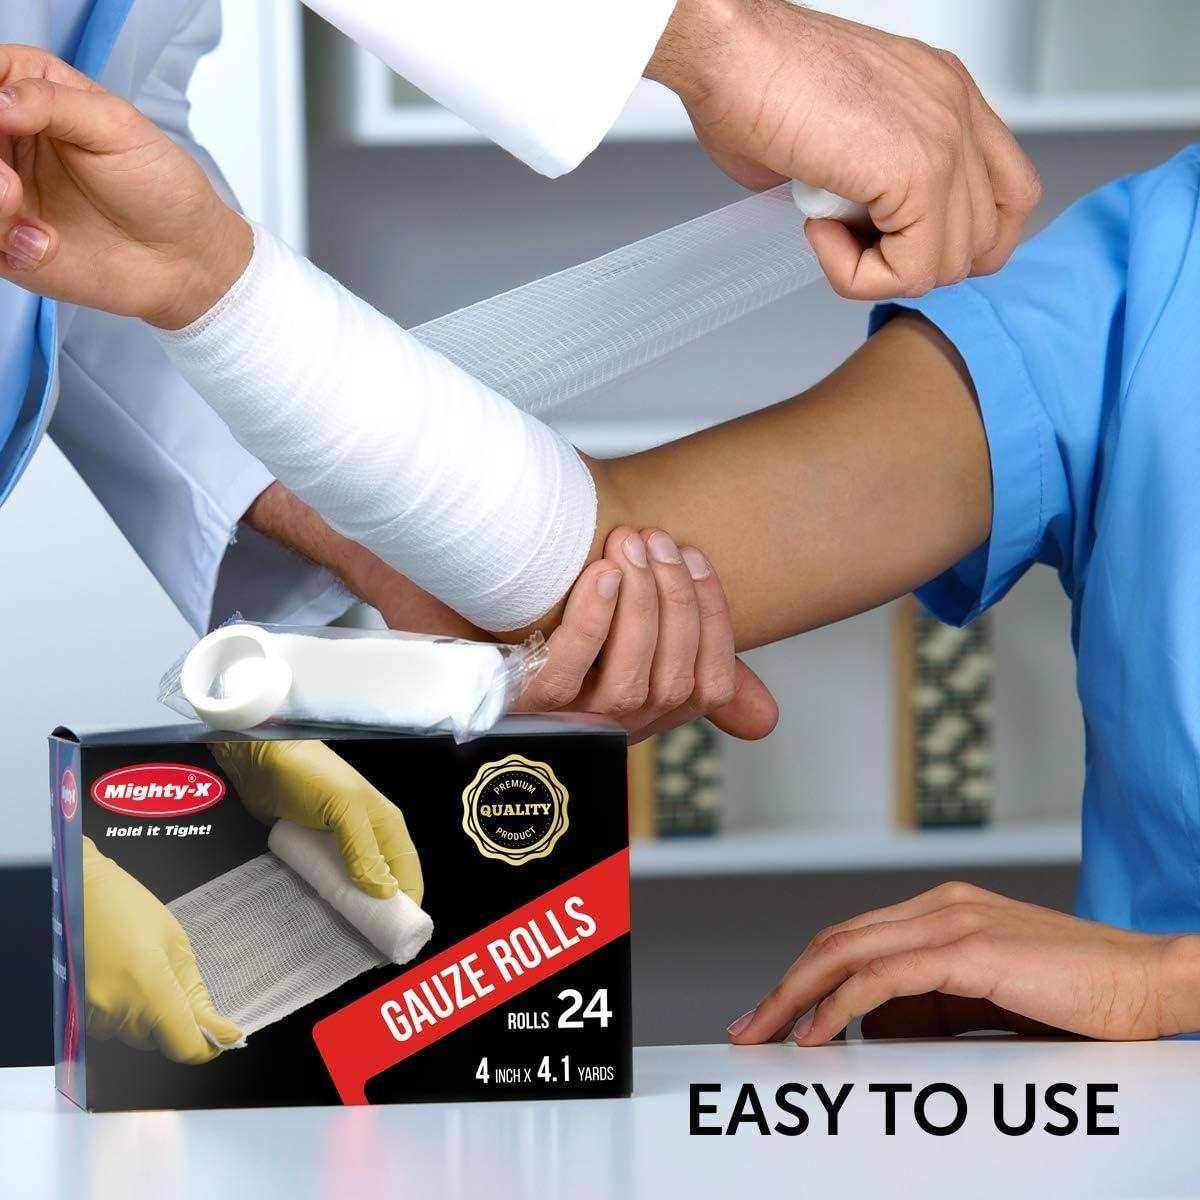 Premium Gauze Bandage Roll - 24 Pack - Gauze Roll (4 inches x 4.1 Yards) - Latex Free Rolled Gauze - Gauze Wrap + Bonus Medical Tape: Health & Personal Care